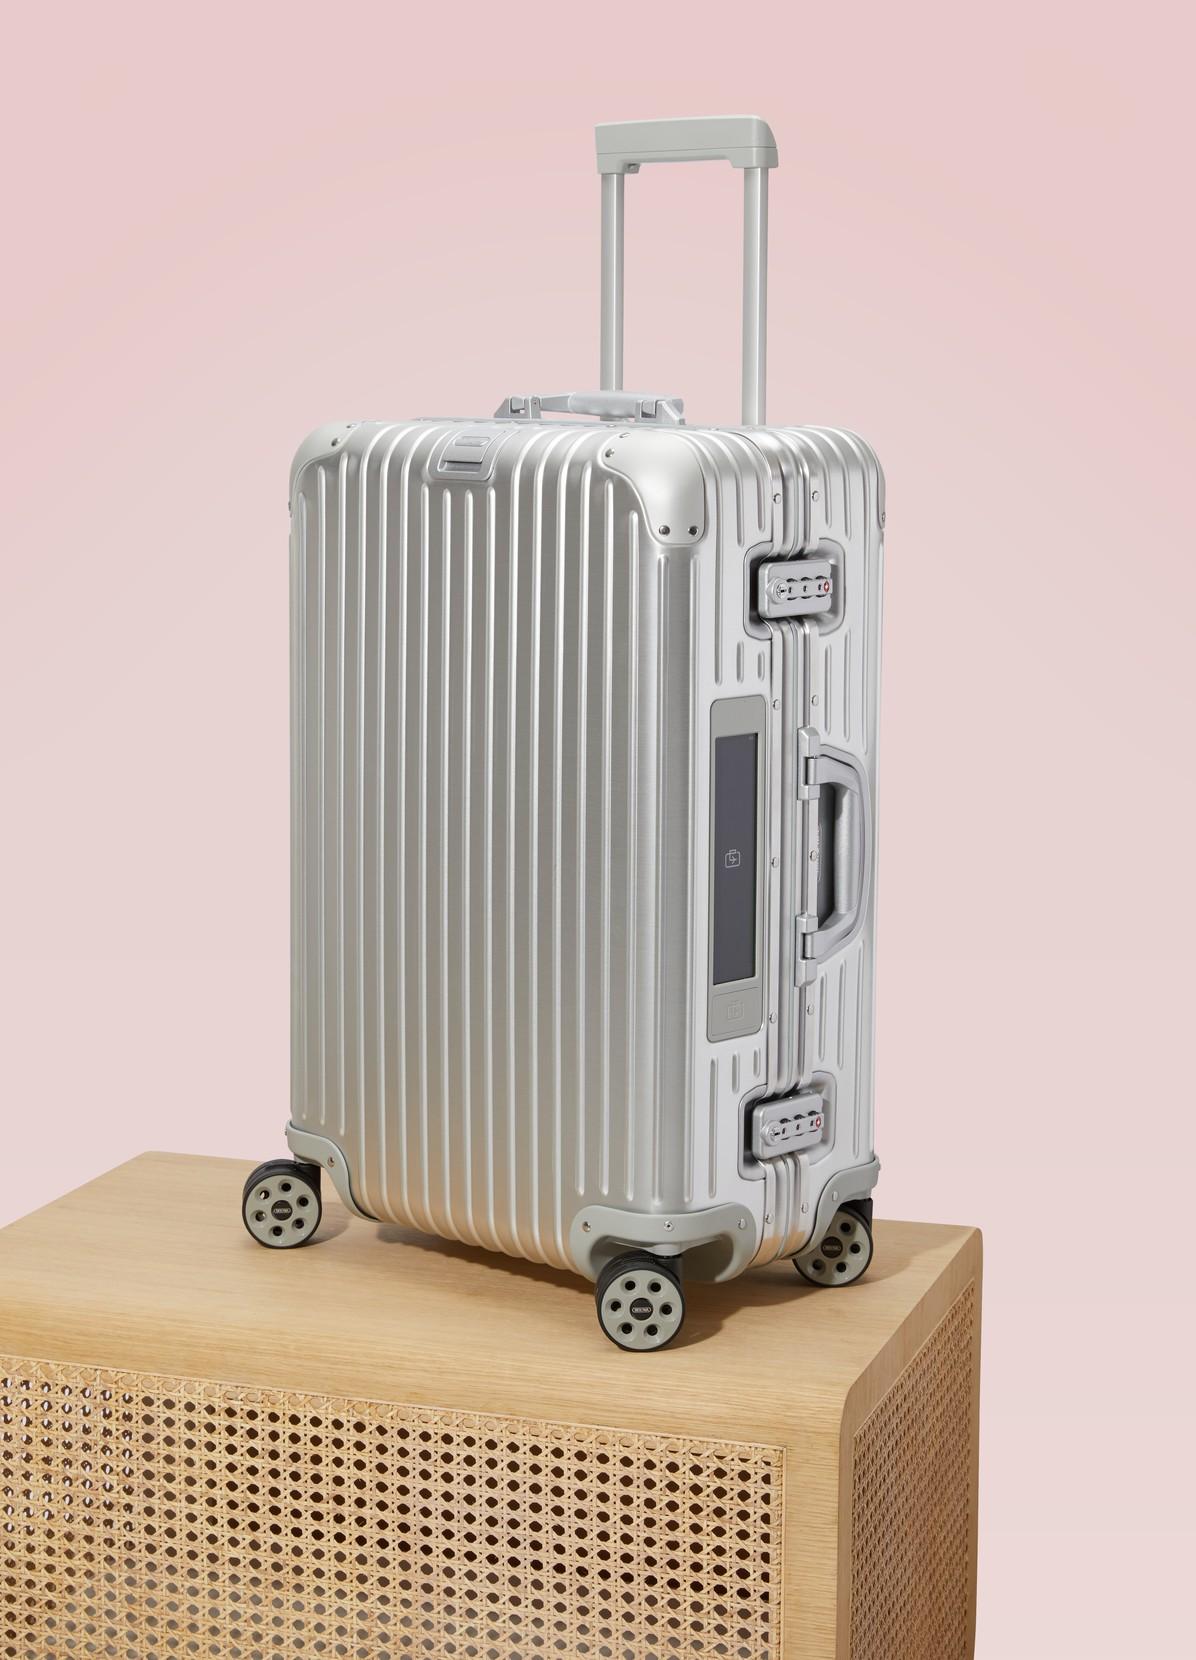 RIMOWATopas multiwheel electronic tag luggage - 67L